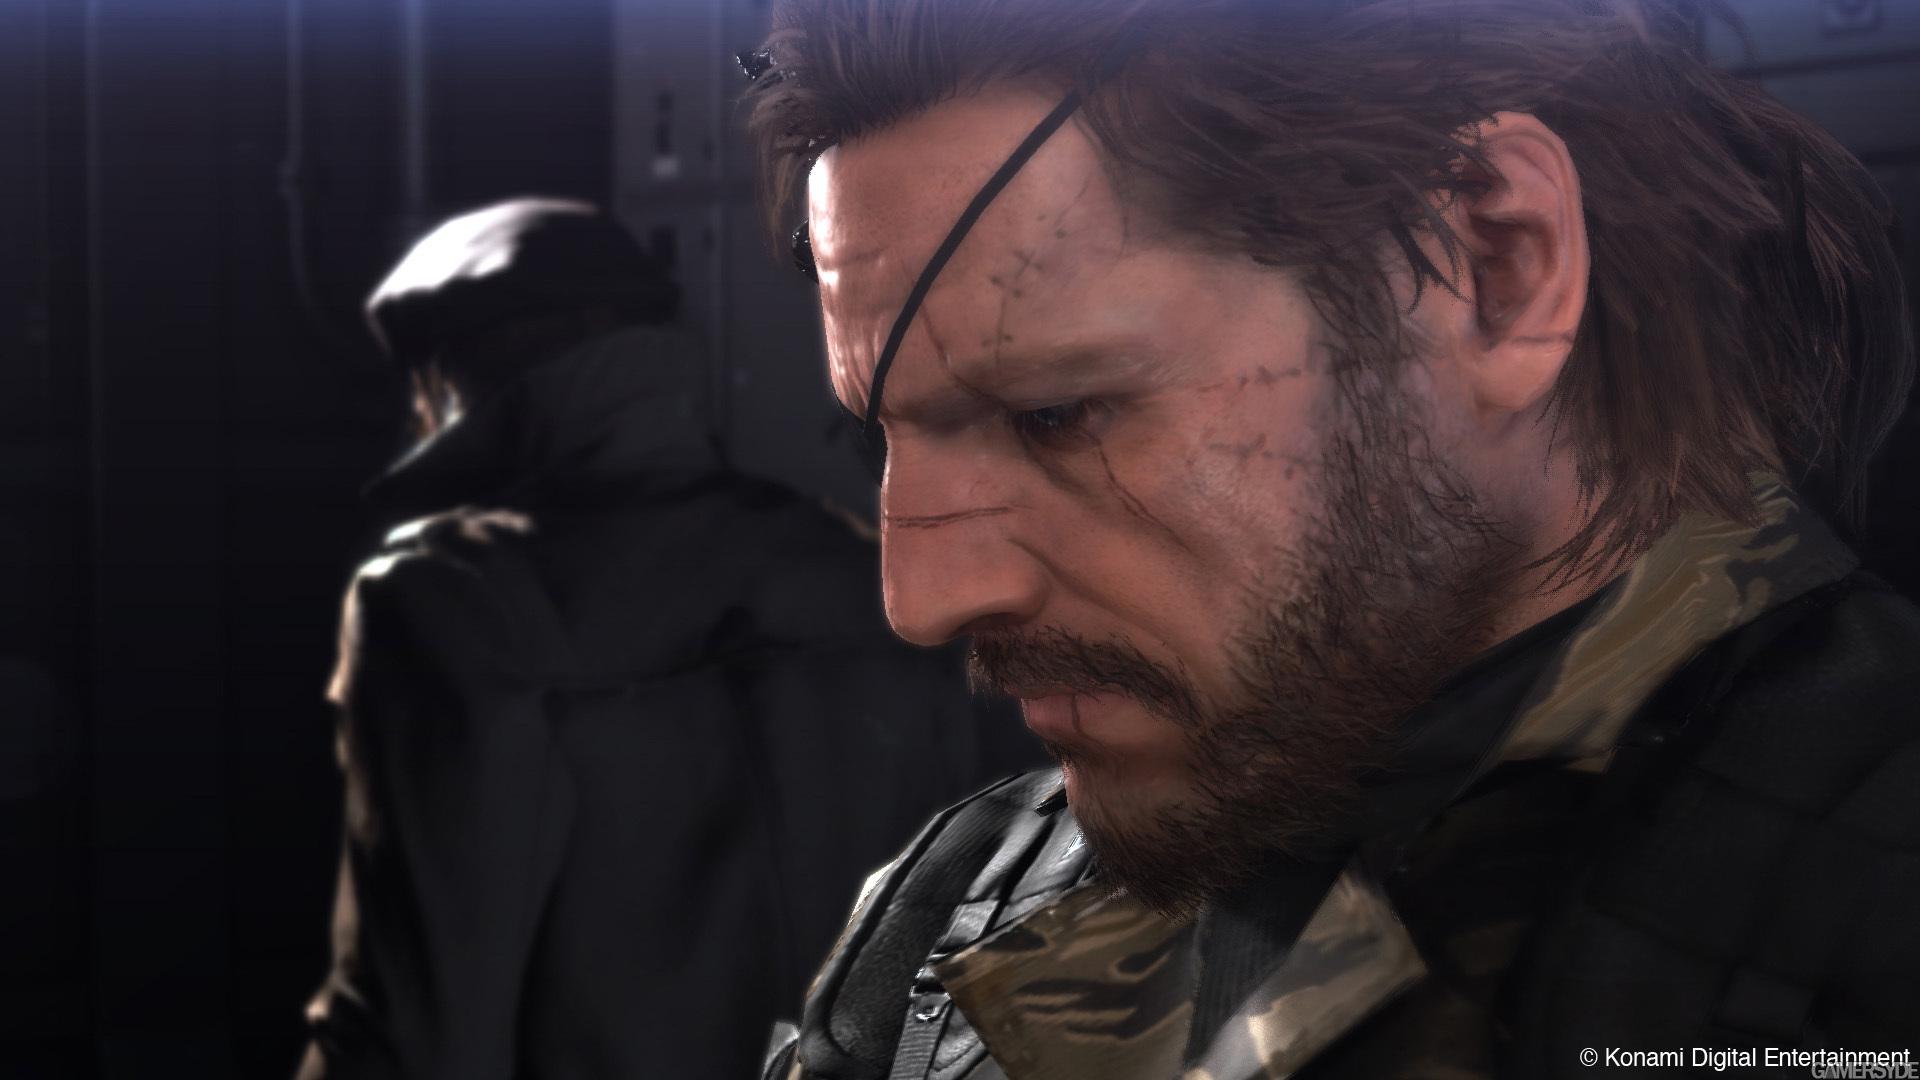 image metal gear solid v the phantom pain 22381 2584 0024 بازگشت پر سر و صدای مار بی صدا ! | تحلیل و بررسی نمایش Metal Gear Solid V : The Phantom Pain در نمایشگاه E3 2013